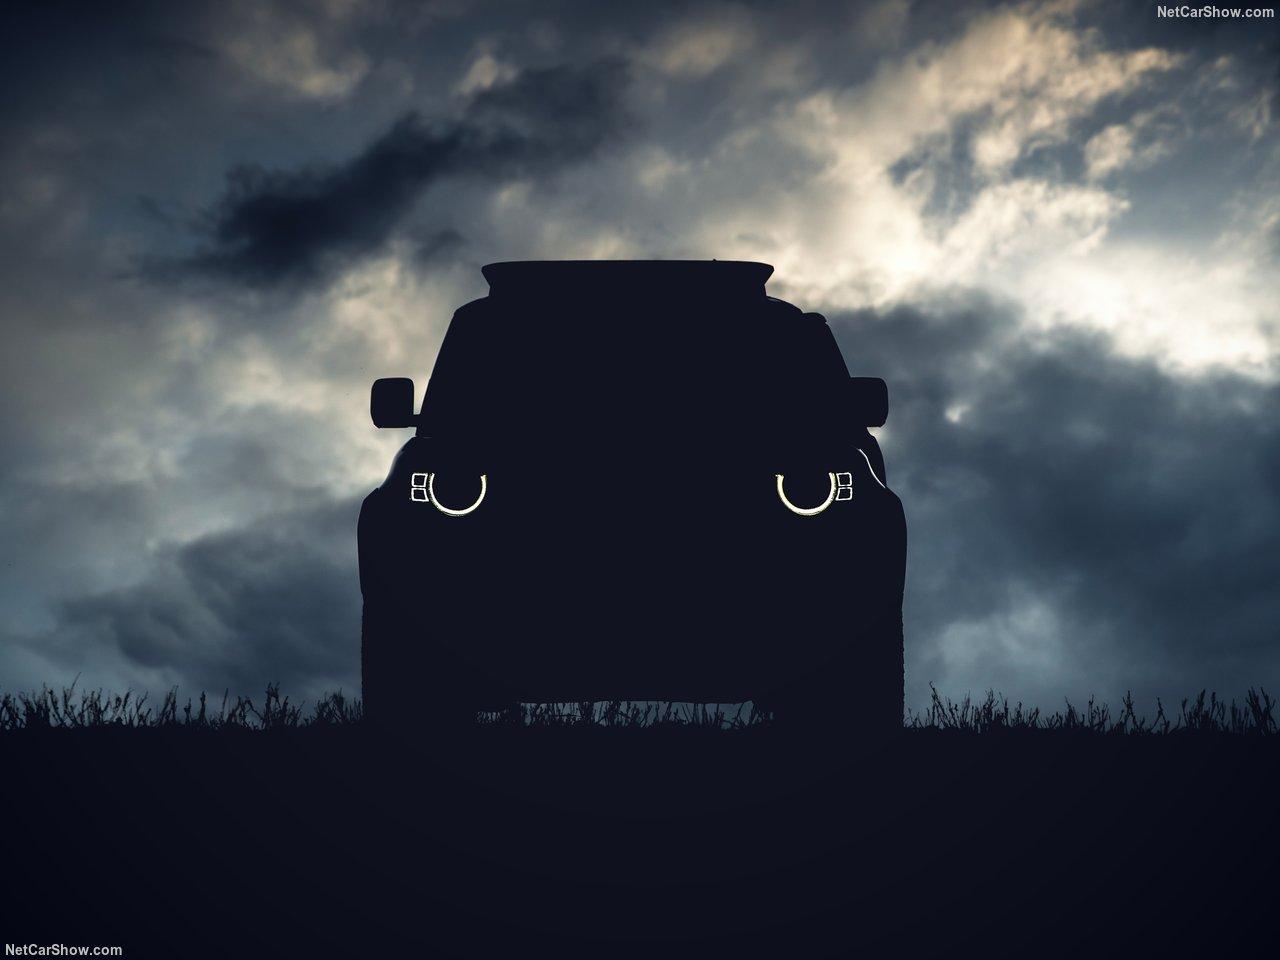 Land_Rover-Defender_110-2020-1280-61.jpg